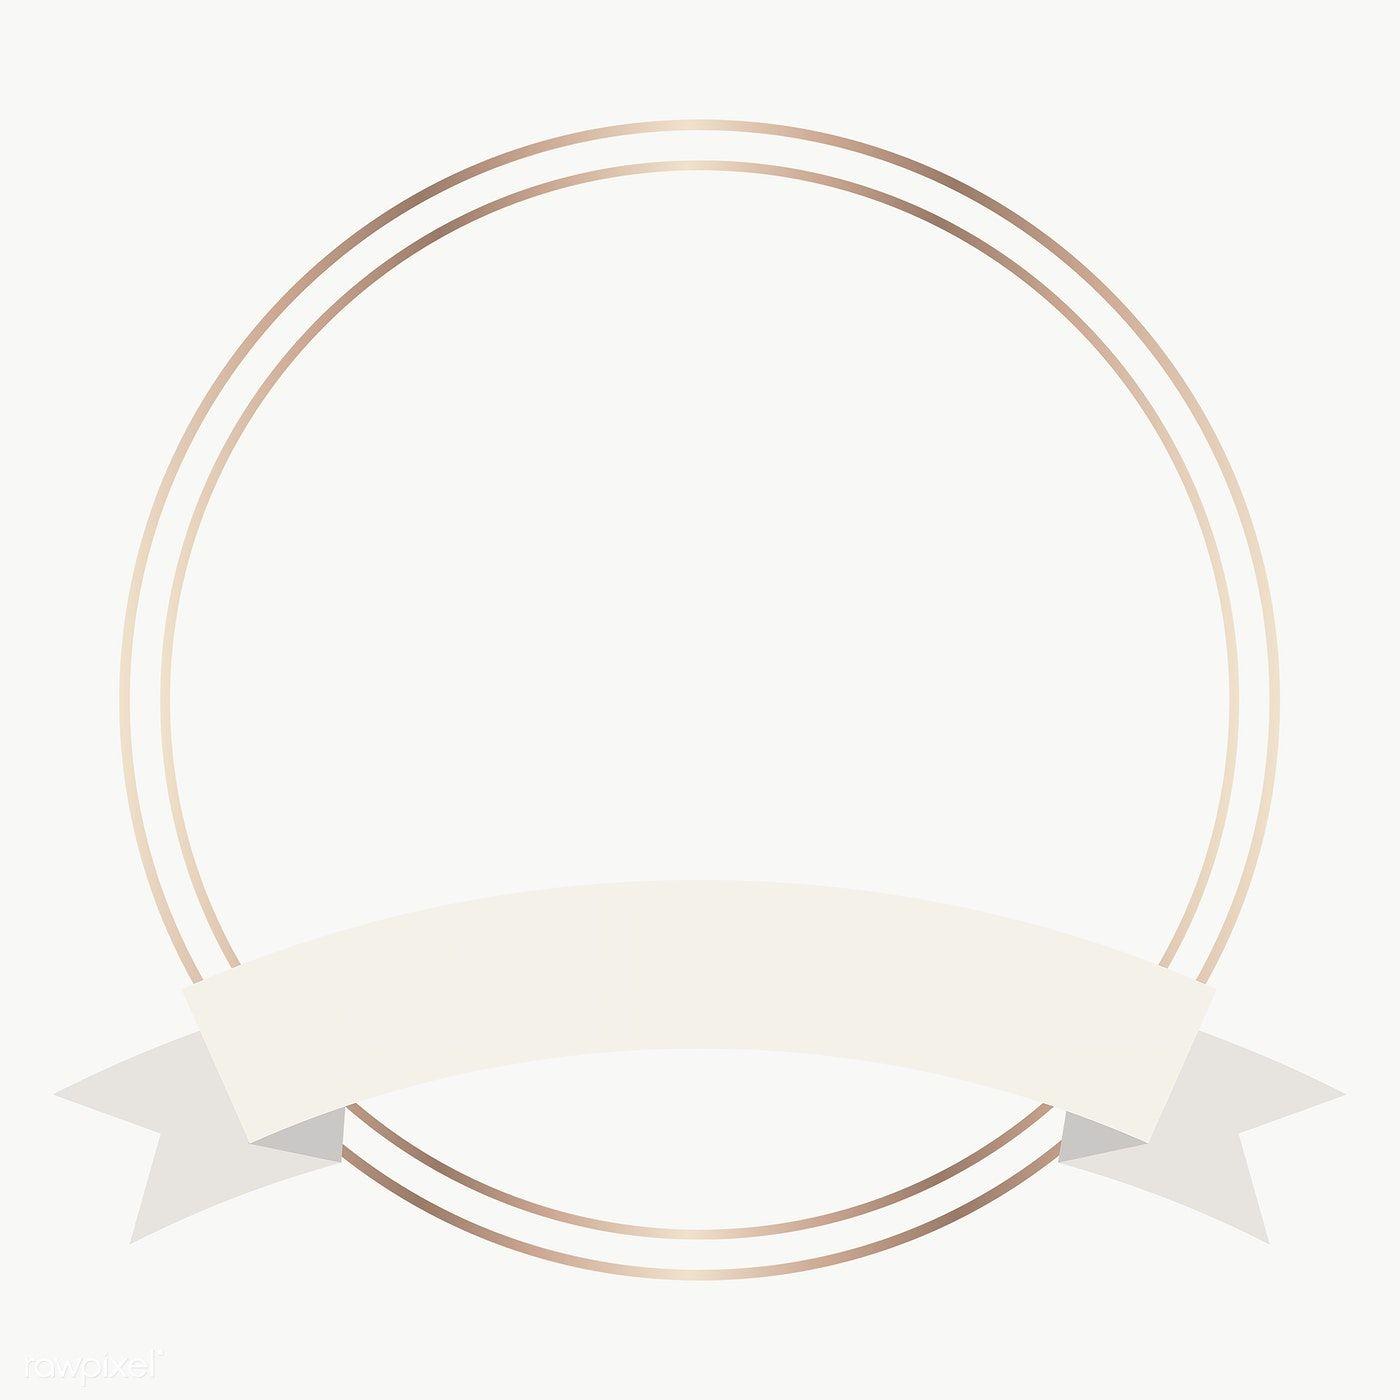 Download Premium Png Of Gold Frame With Beige Ribbon Banner Transparent In 2020 Frame Logo Gold Circle Frames Ribbon Banner